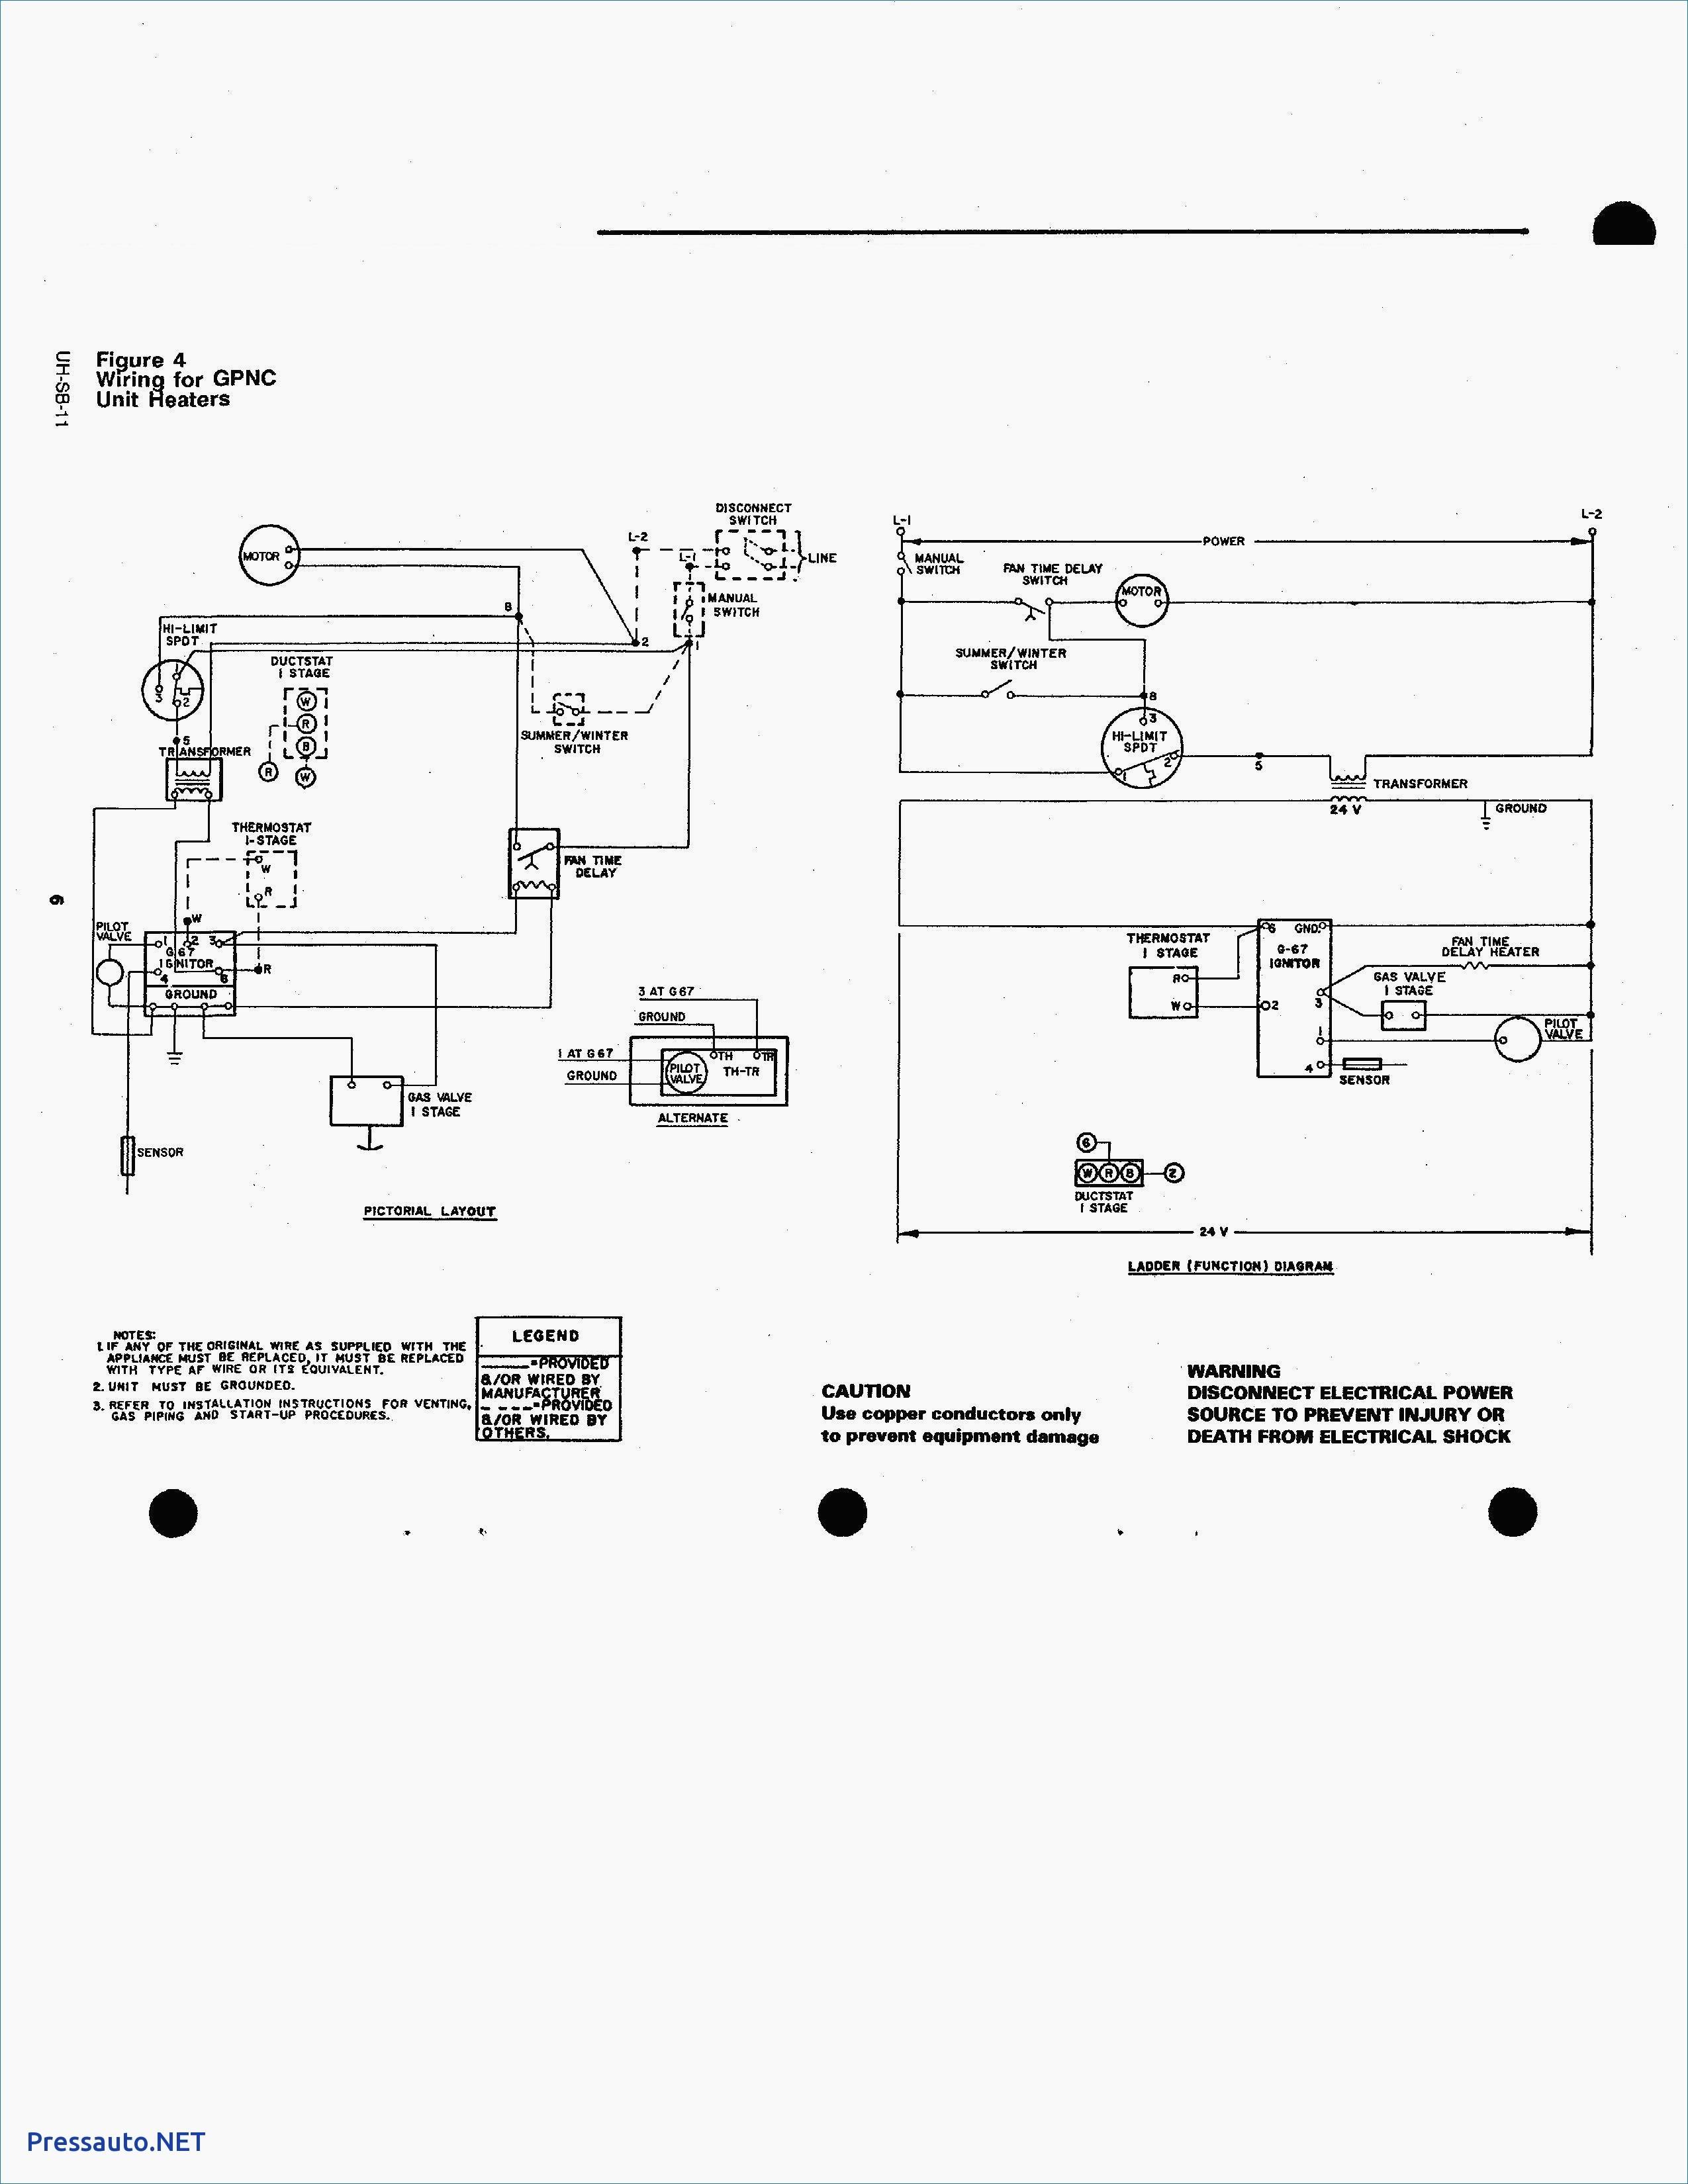 Trane Wiring Diagram Heat Pump - Wiring Solutions